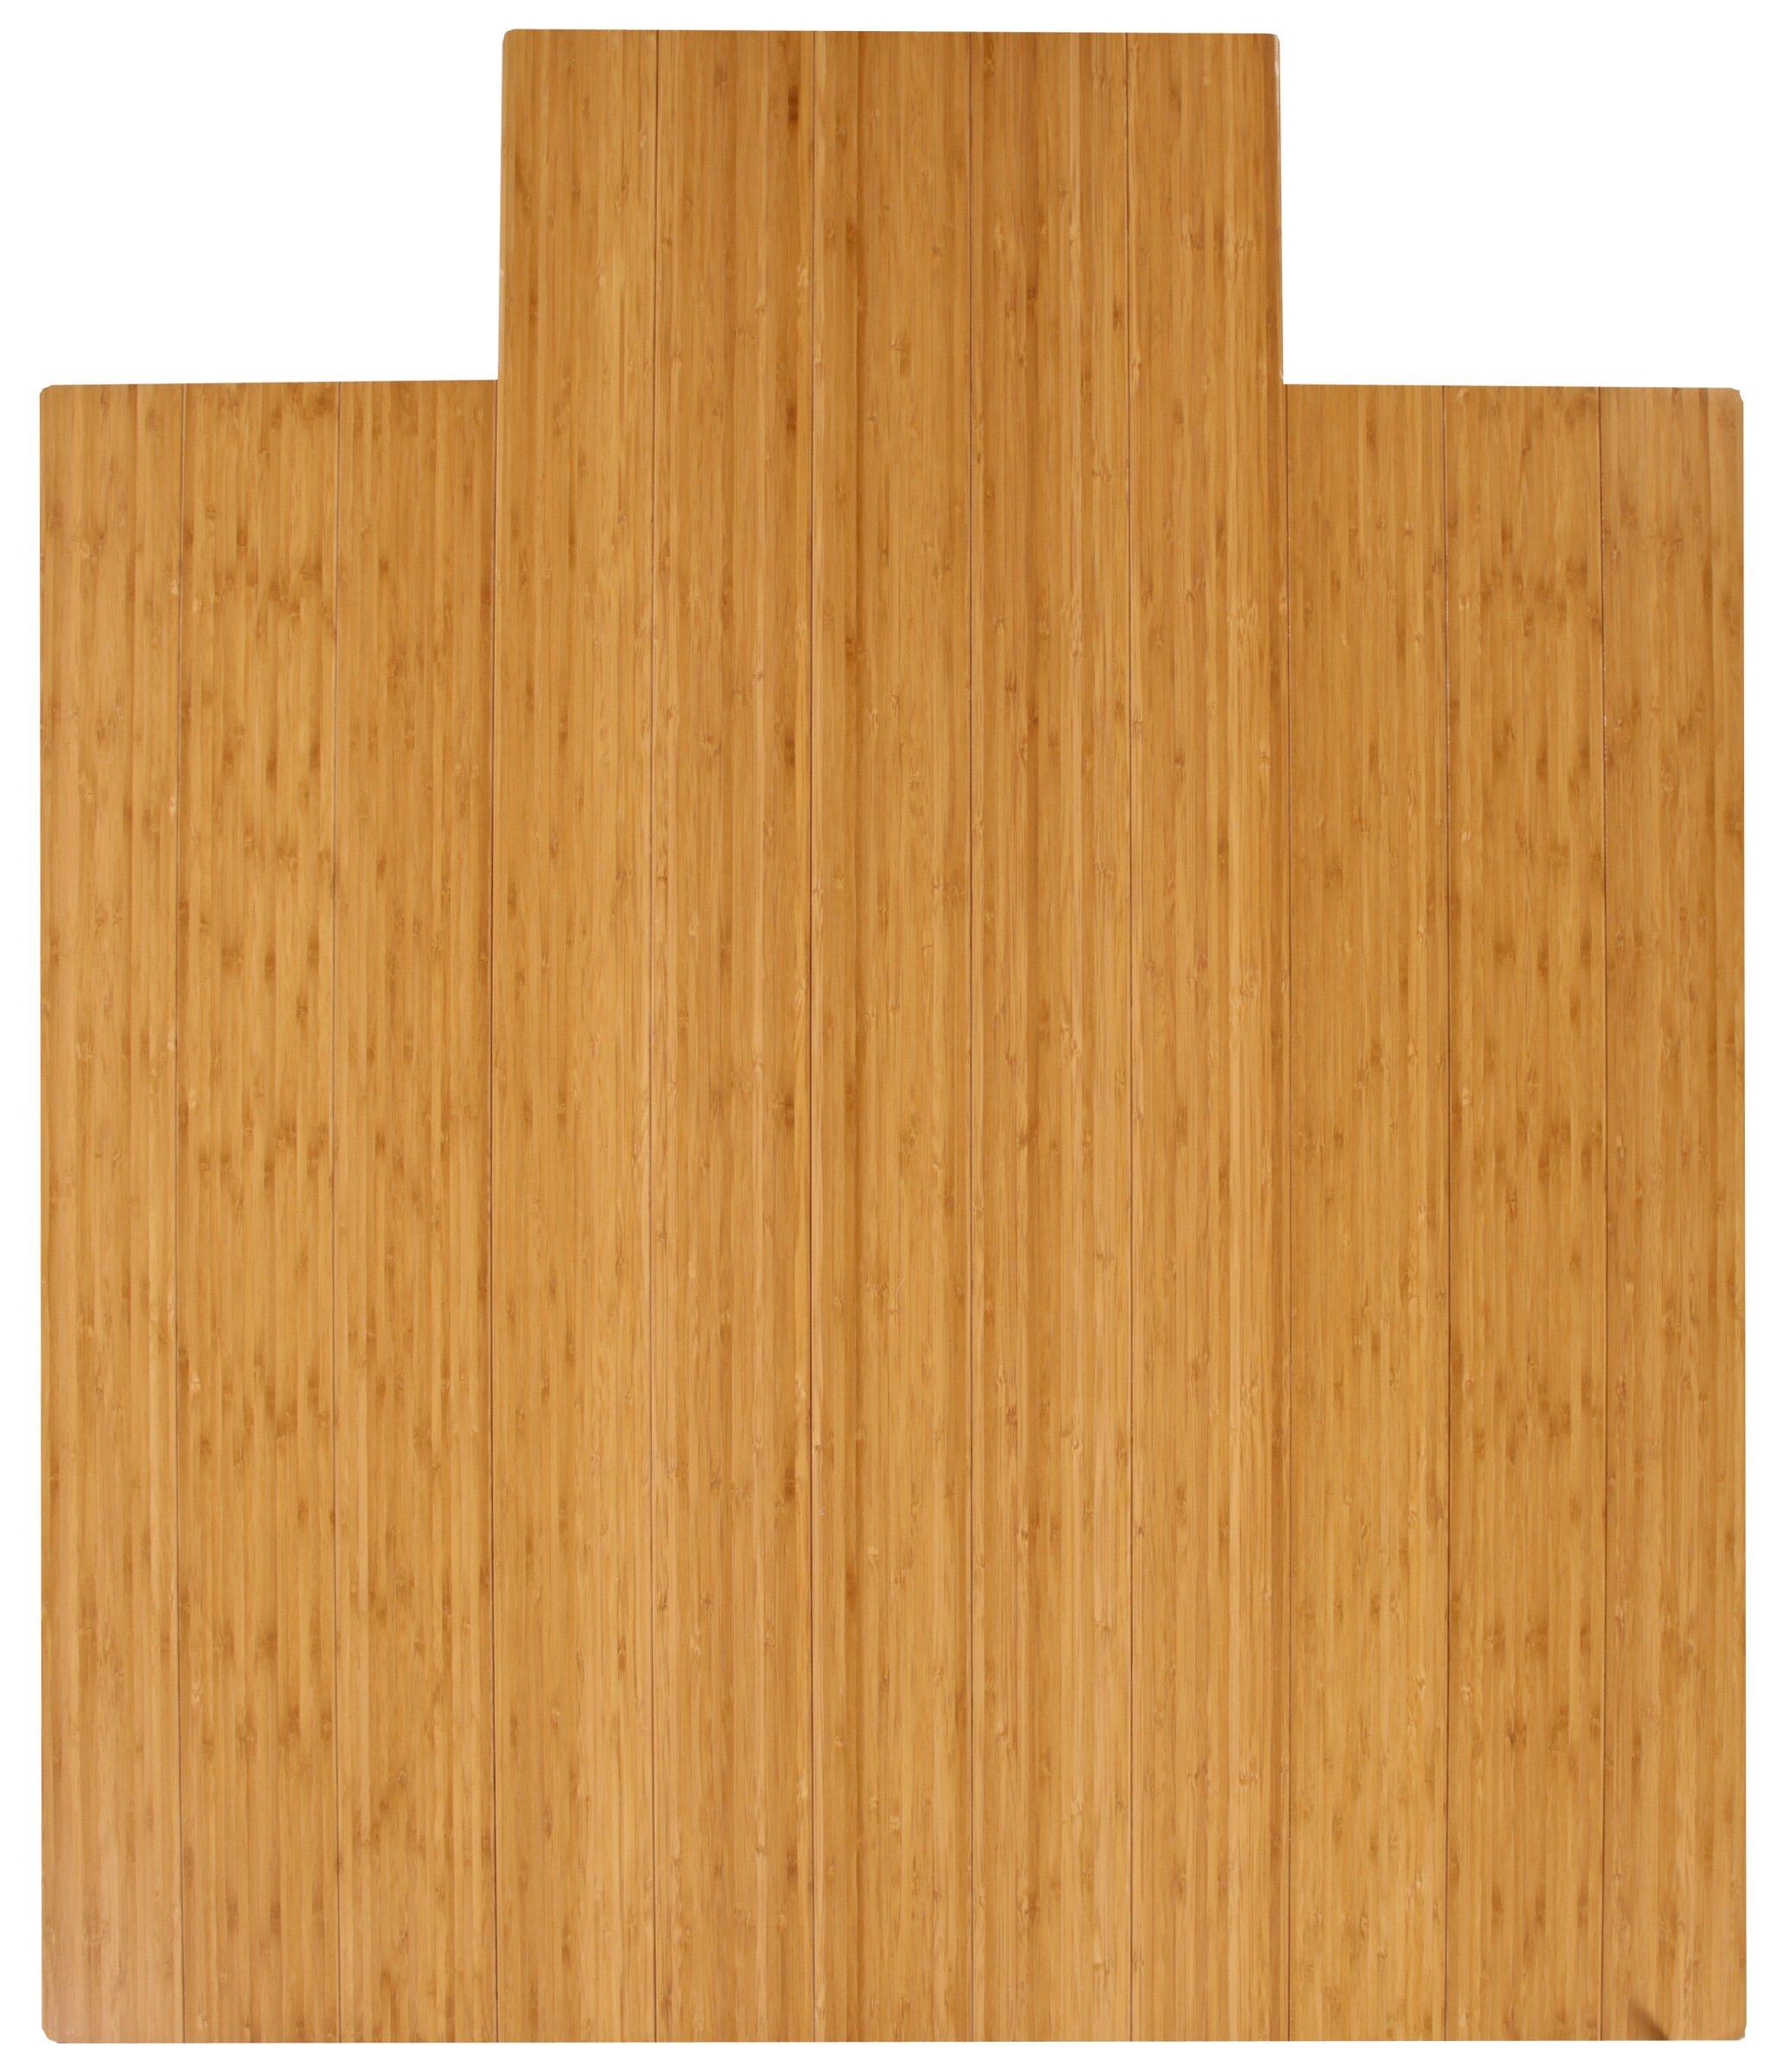 Anji Mountain AMB24005W Wood Chair Mat 44 x 52-Inch Natural